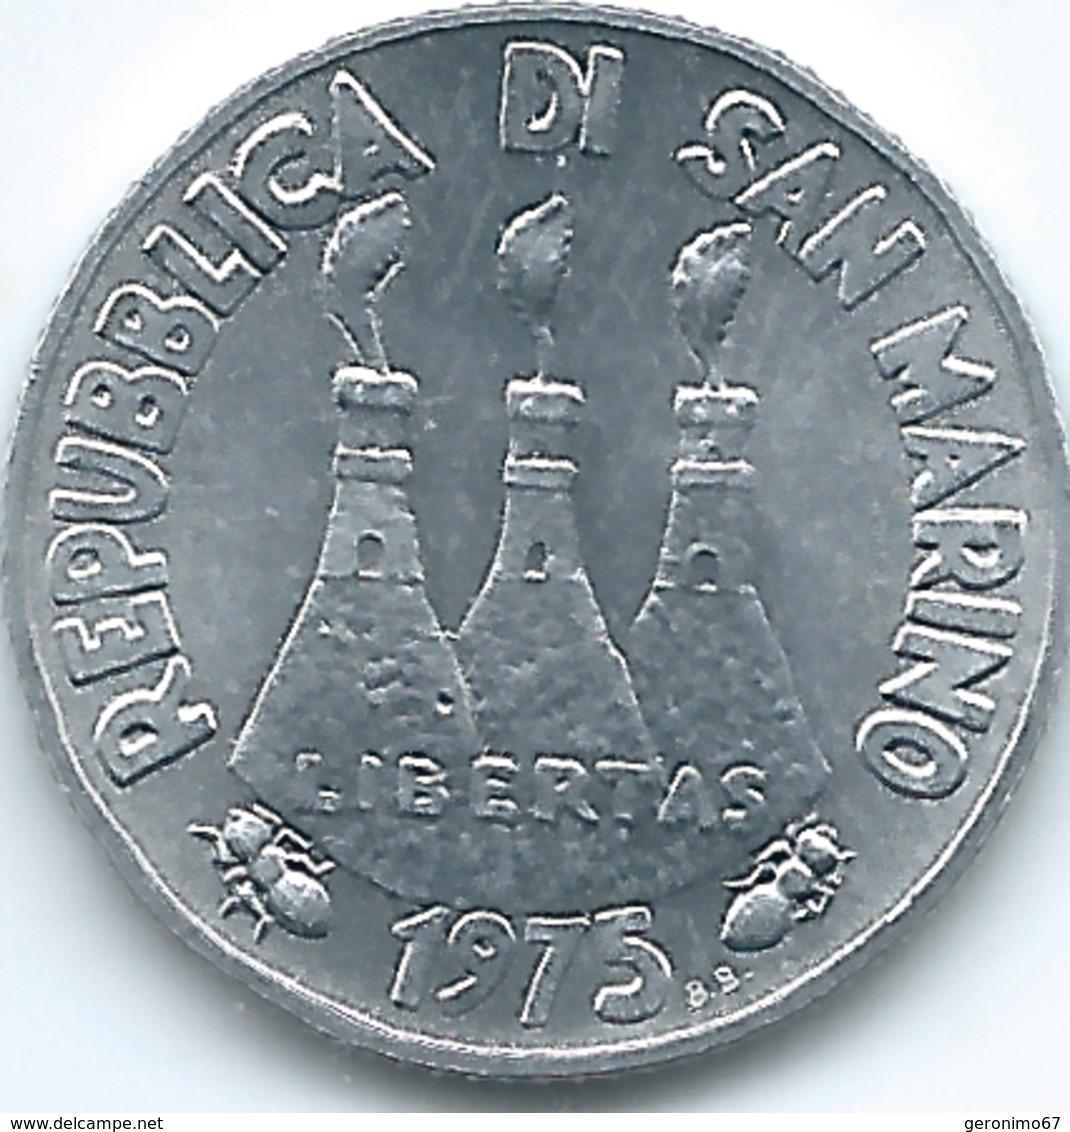 San Marino - 1975 - 2 Lire - KM41 - San Marino